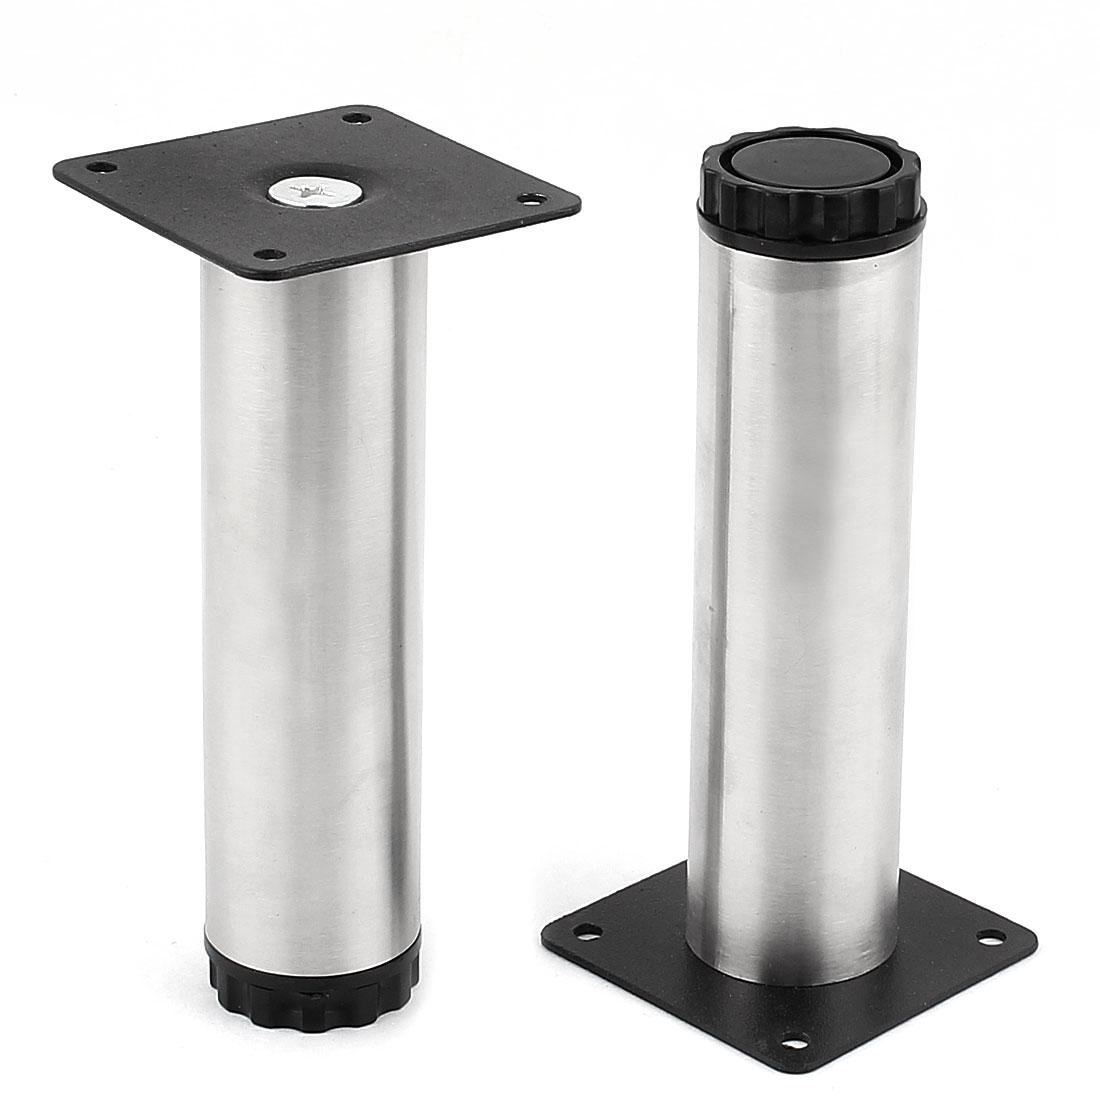 Kitchen Furniture Unit 150mm High Adjustable Cabinet Leg Plinth Feet 2pcs